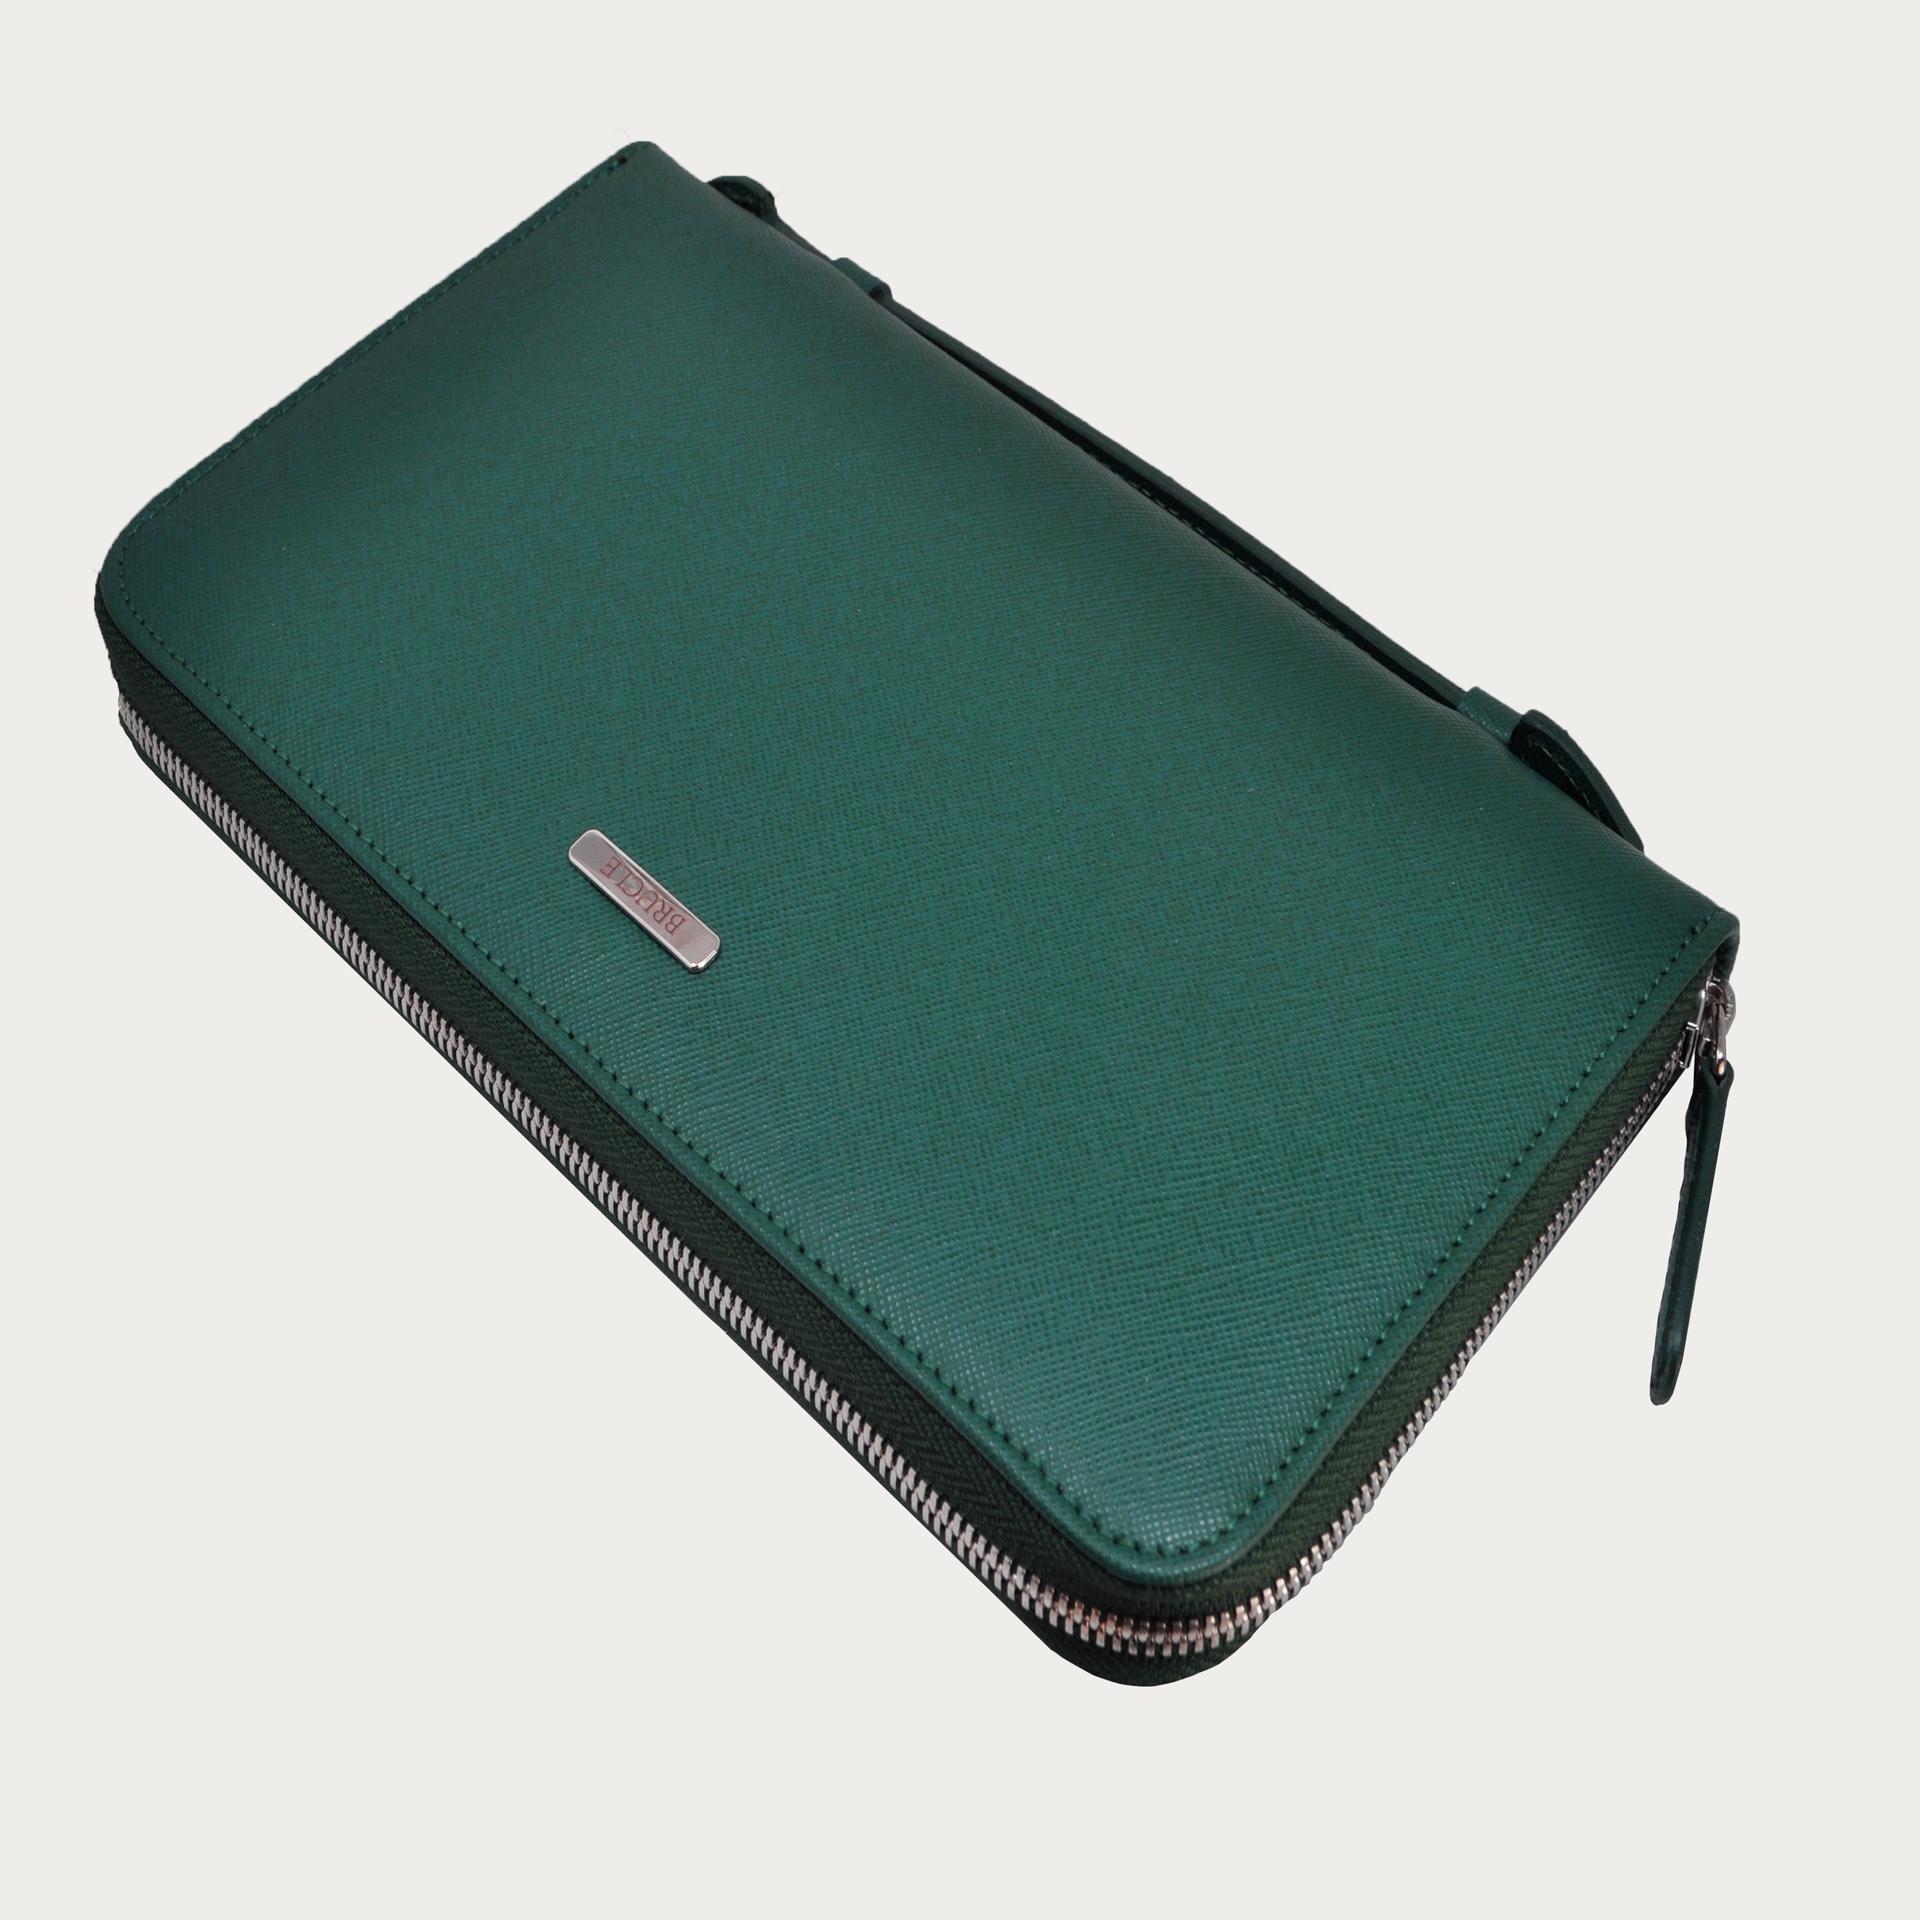 Portefeuille porte document en cuir saffiano, vert